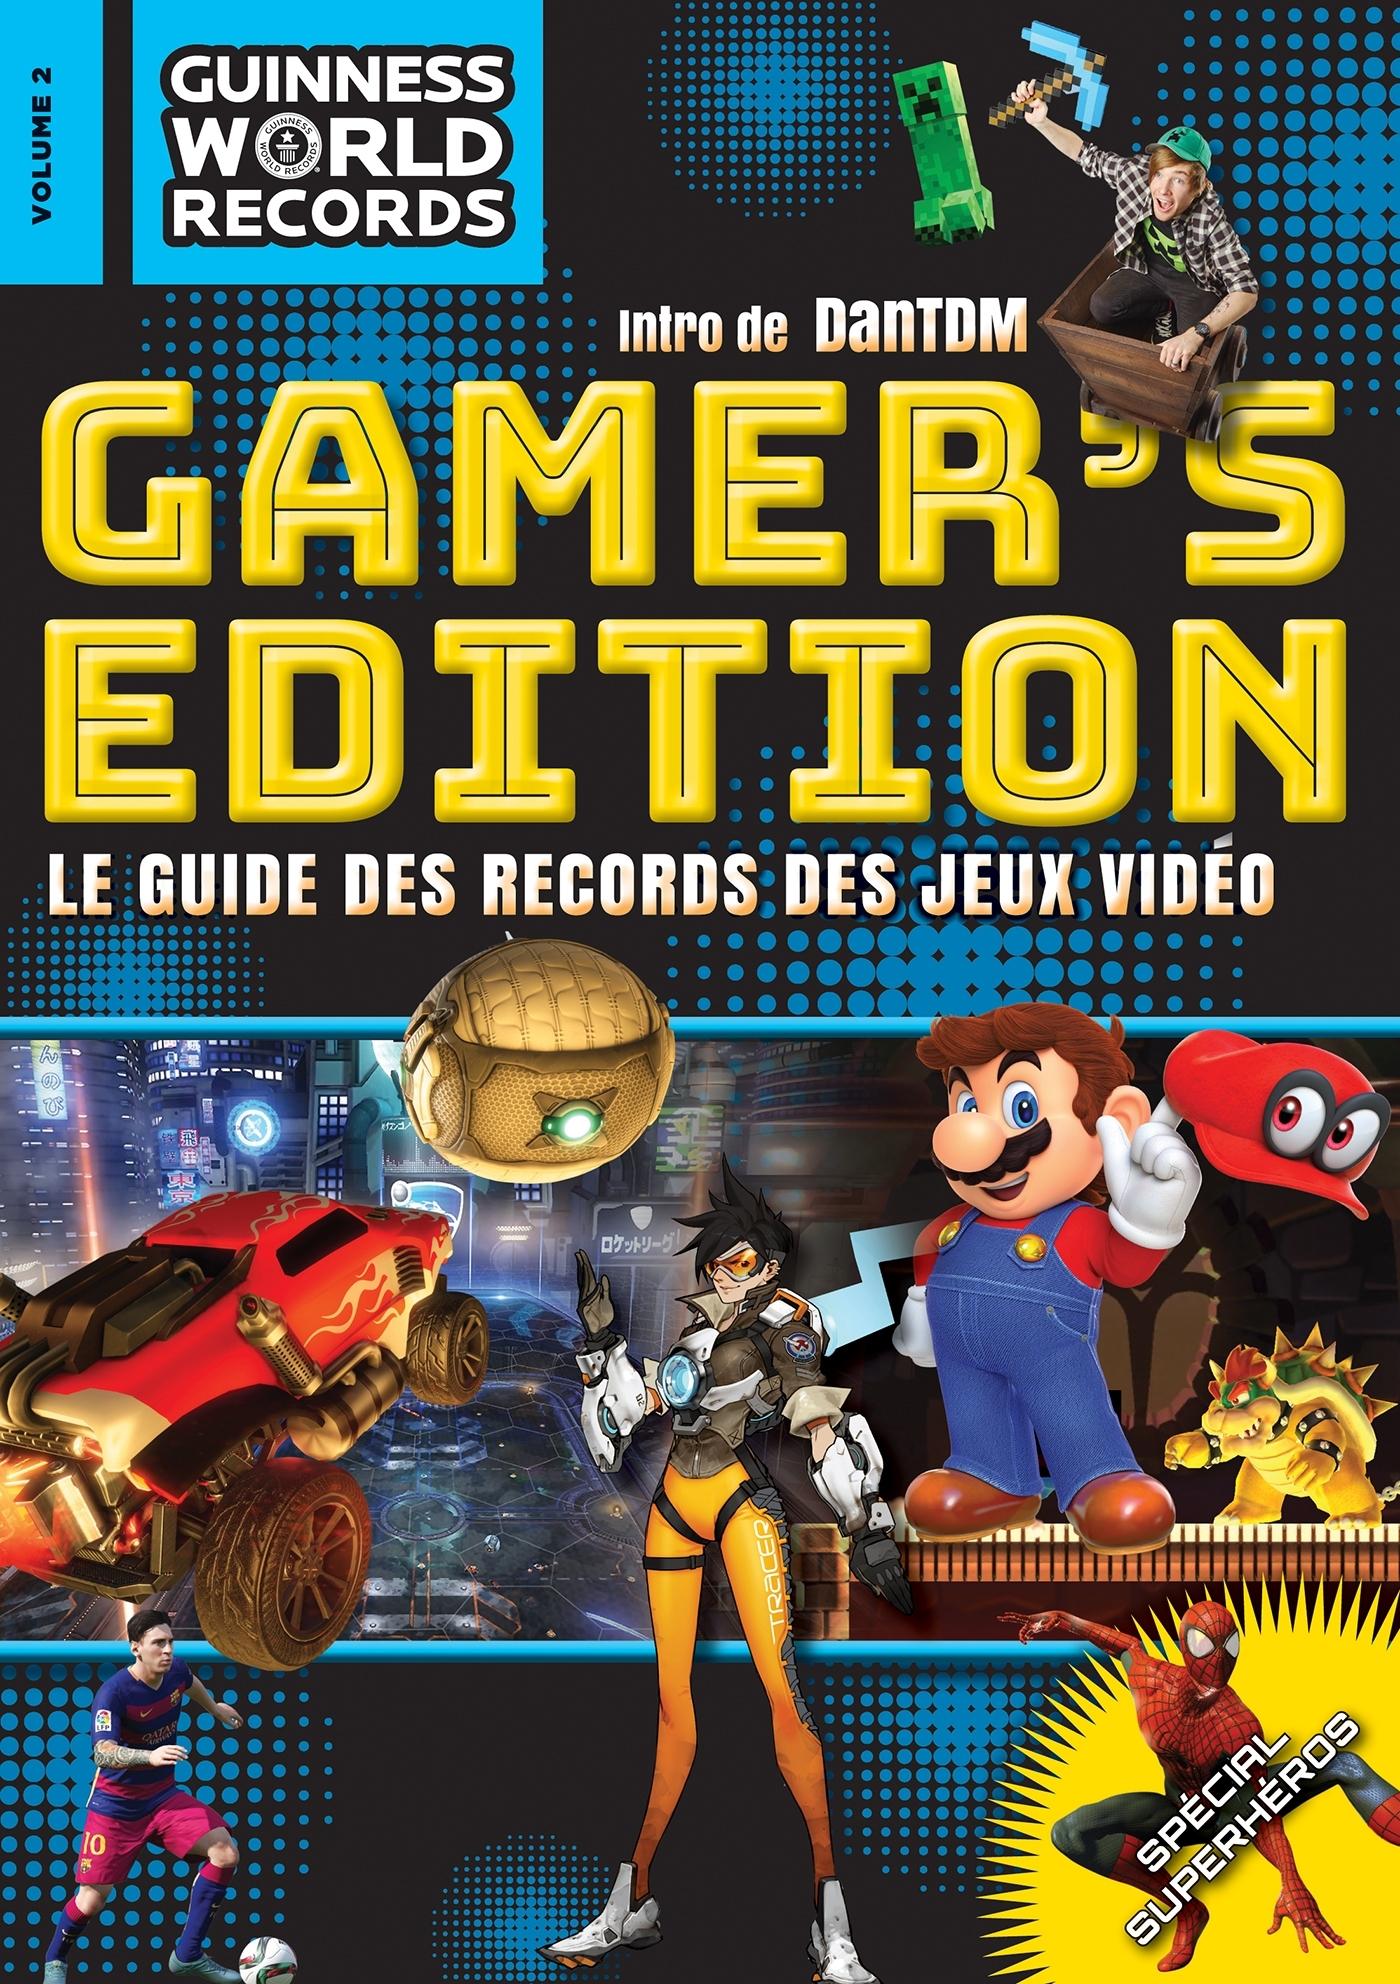 GUINNESS WORLD RECORDS GAMERS 2018 - LE GUIDE DES RECORDS DES JEUX VIDEO